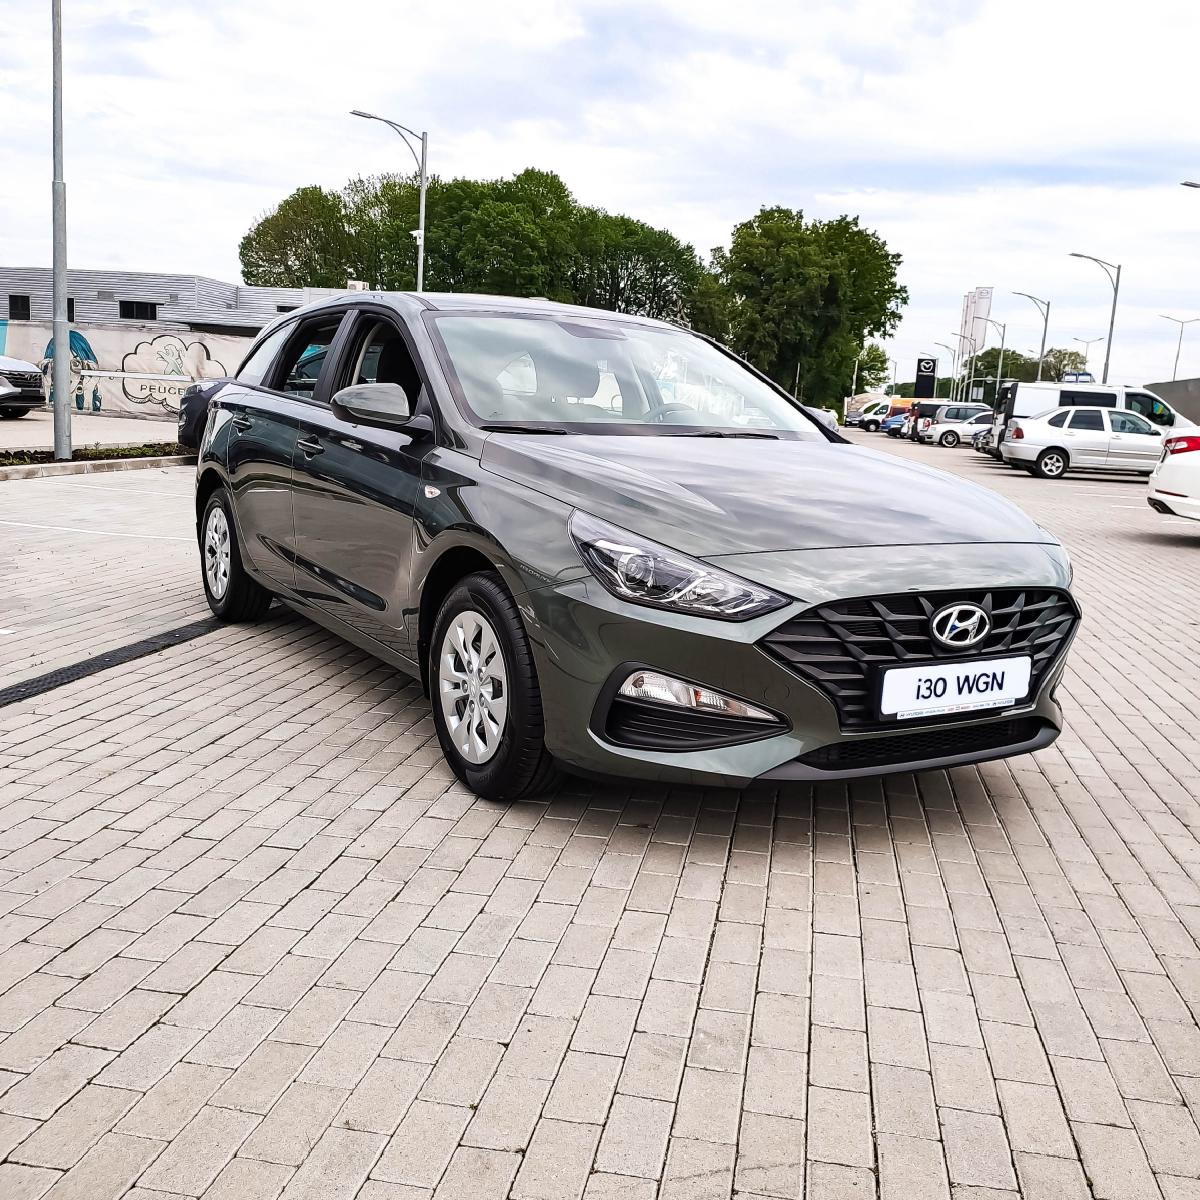 Спеціальна вигода на придбання Hyundai i30 WGN! | Хюндай Мотор Україна - фото 13